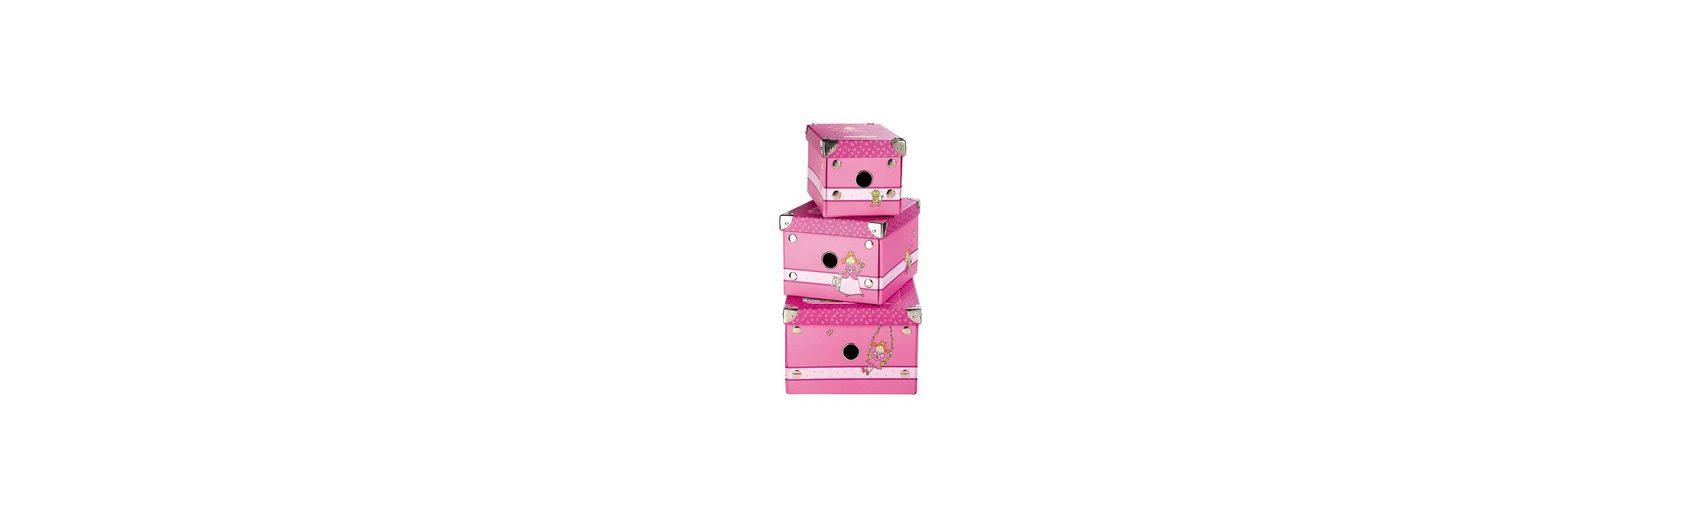 sigikid Boxen 3-er Set Pinky Queeny (24396)